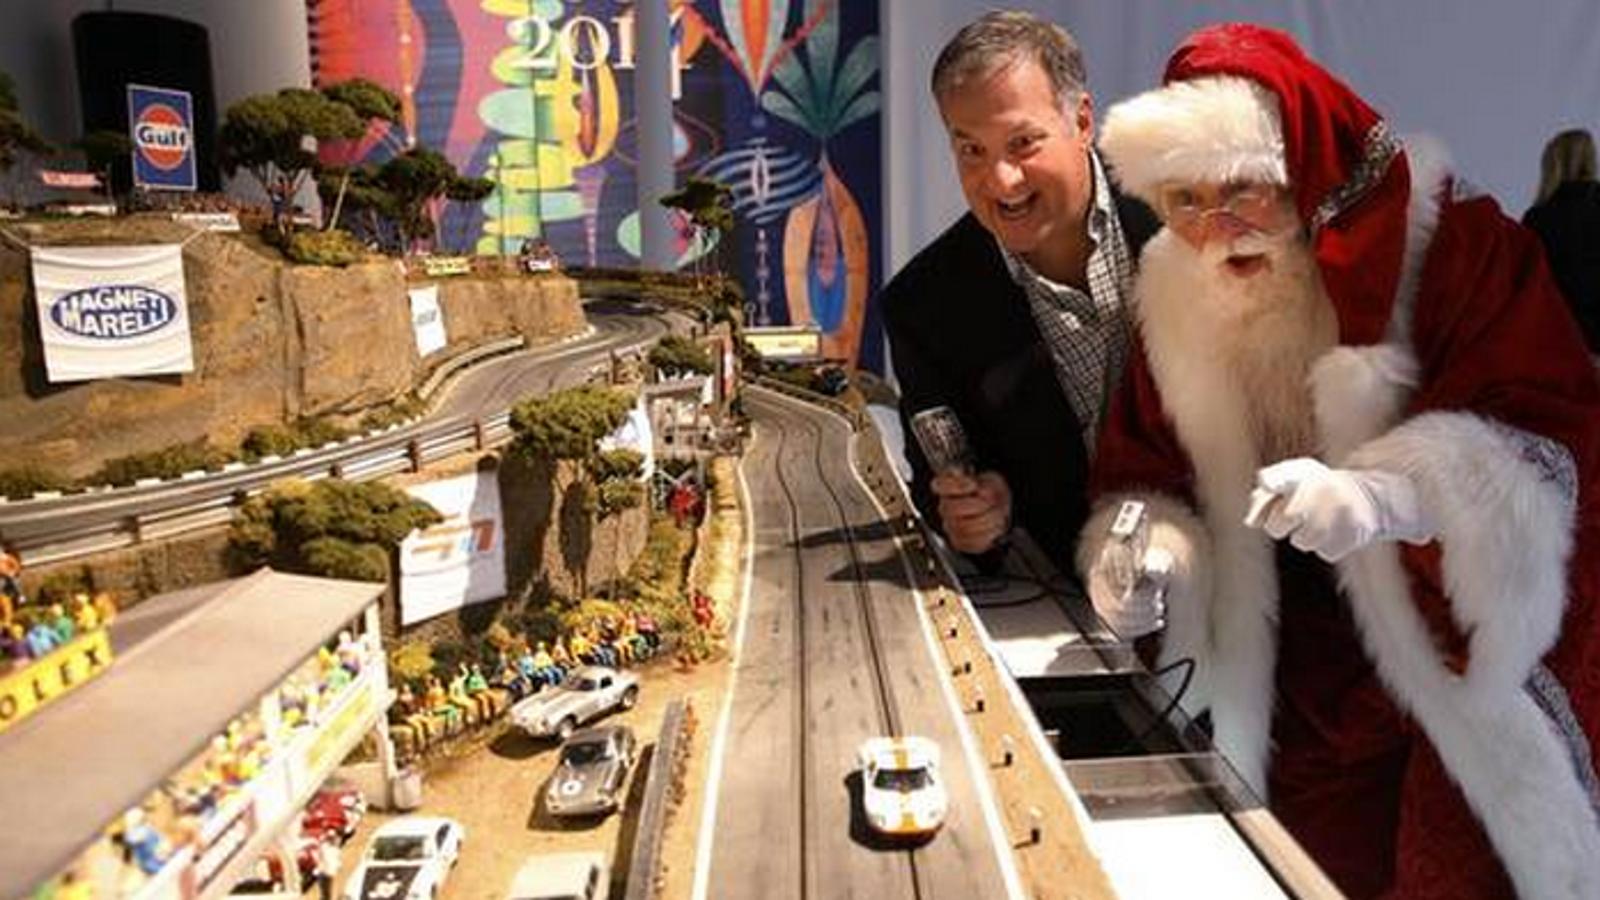 Neiman Marcus offering $300,000 custom slot car track